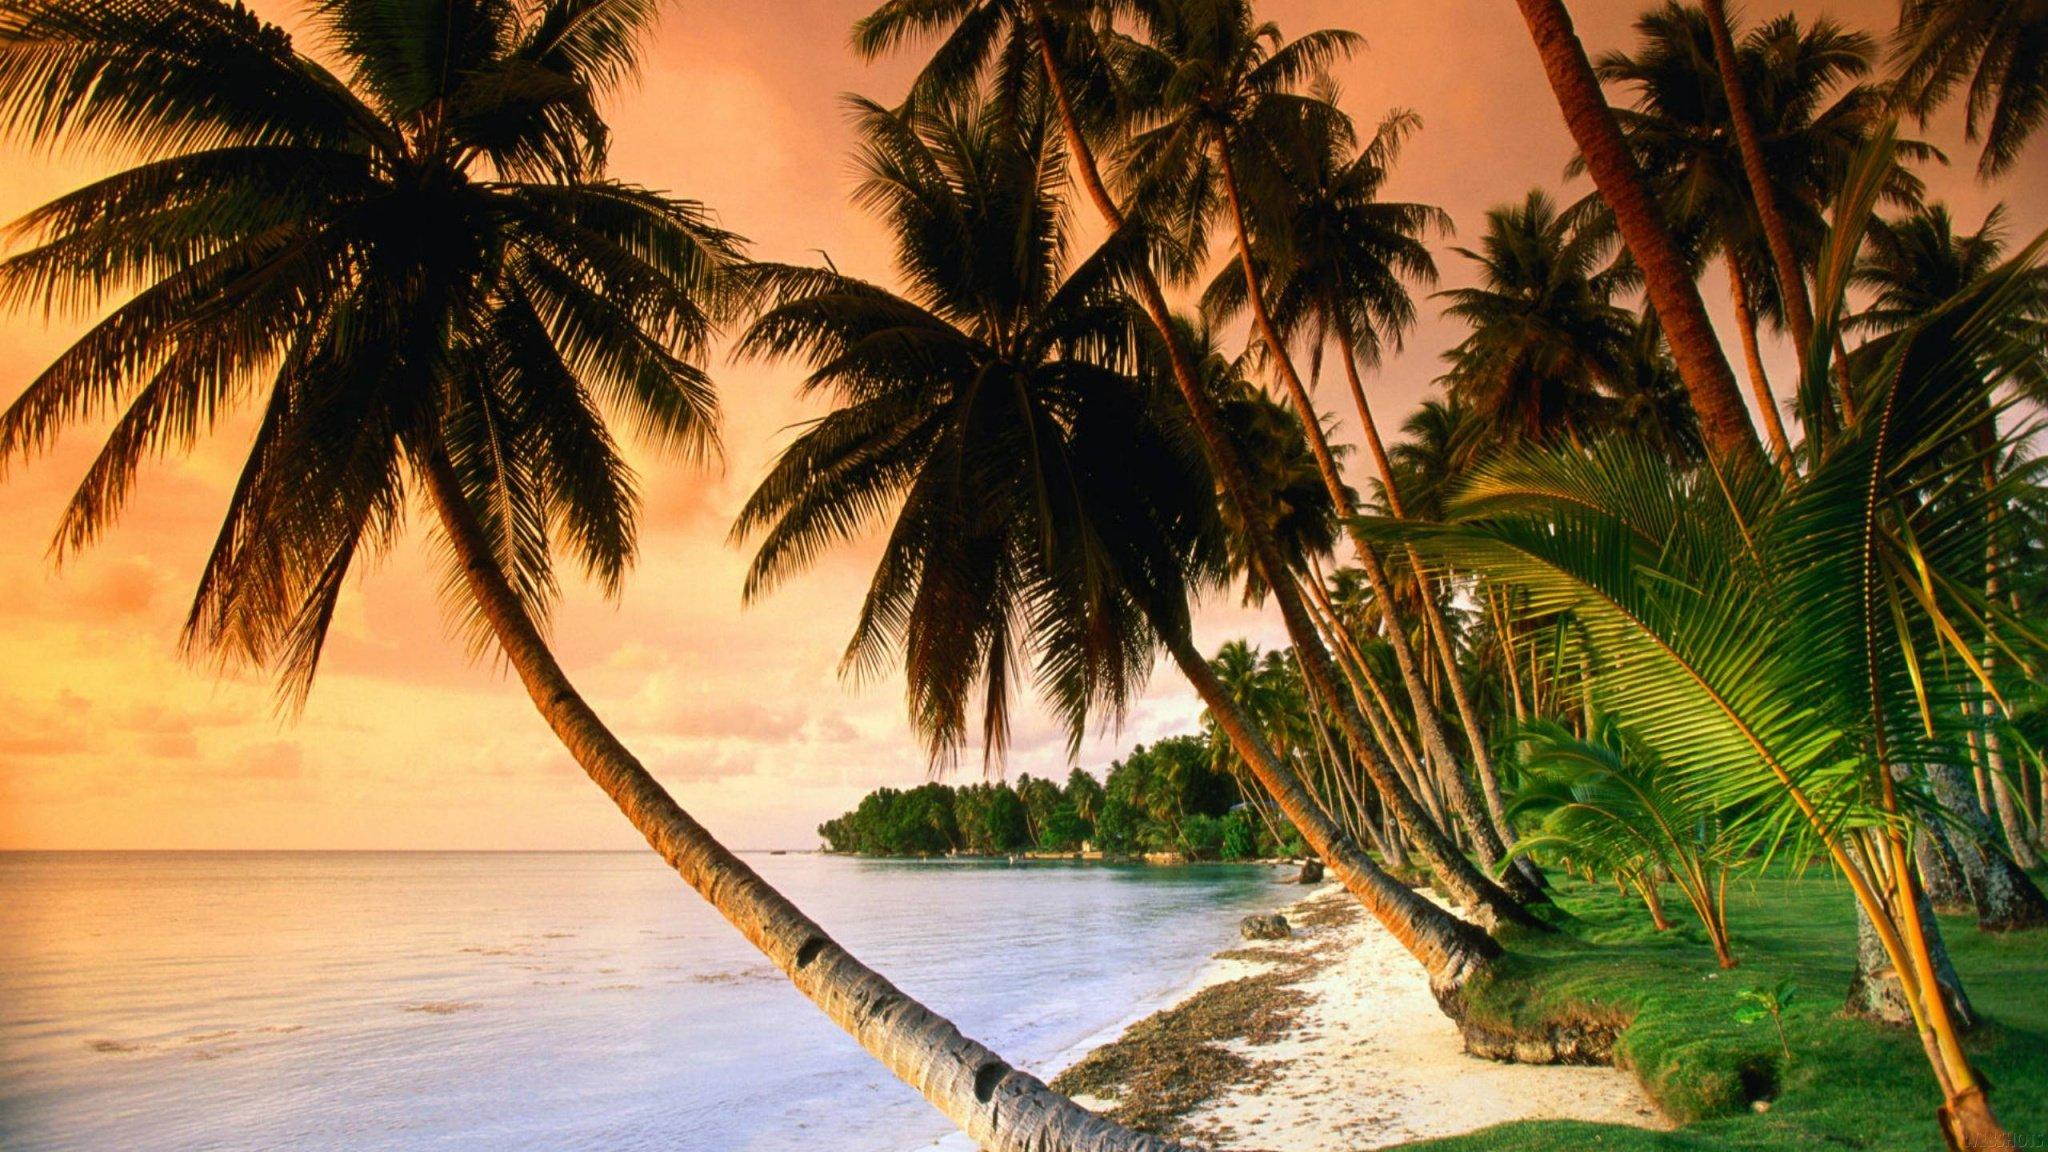 Palm Tree Screensaver High Definition